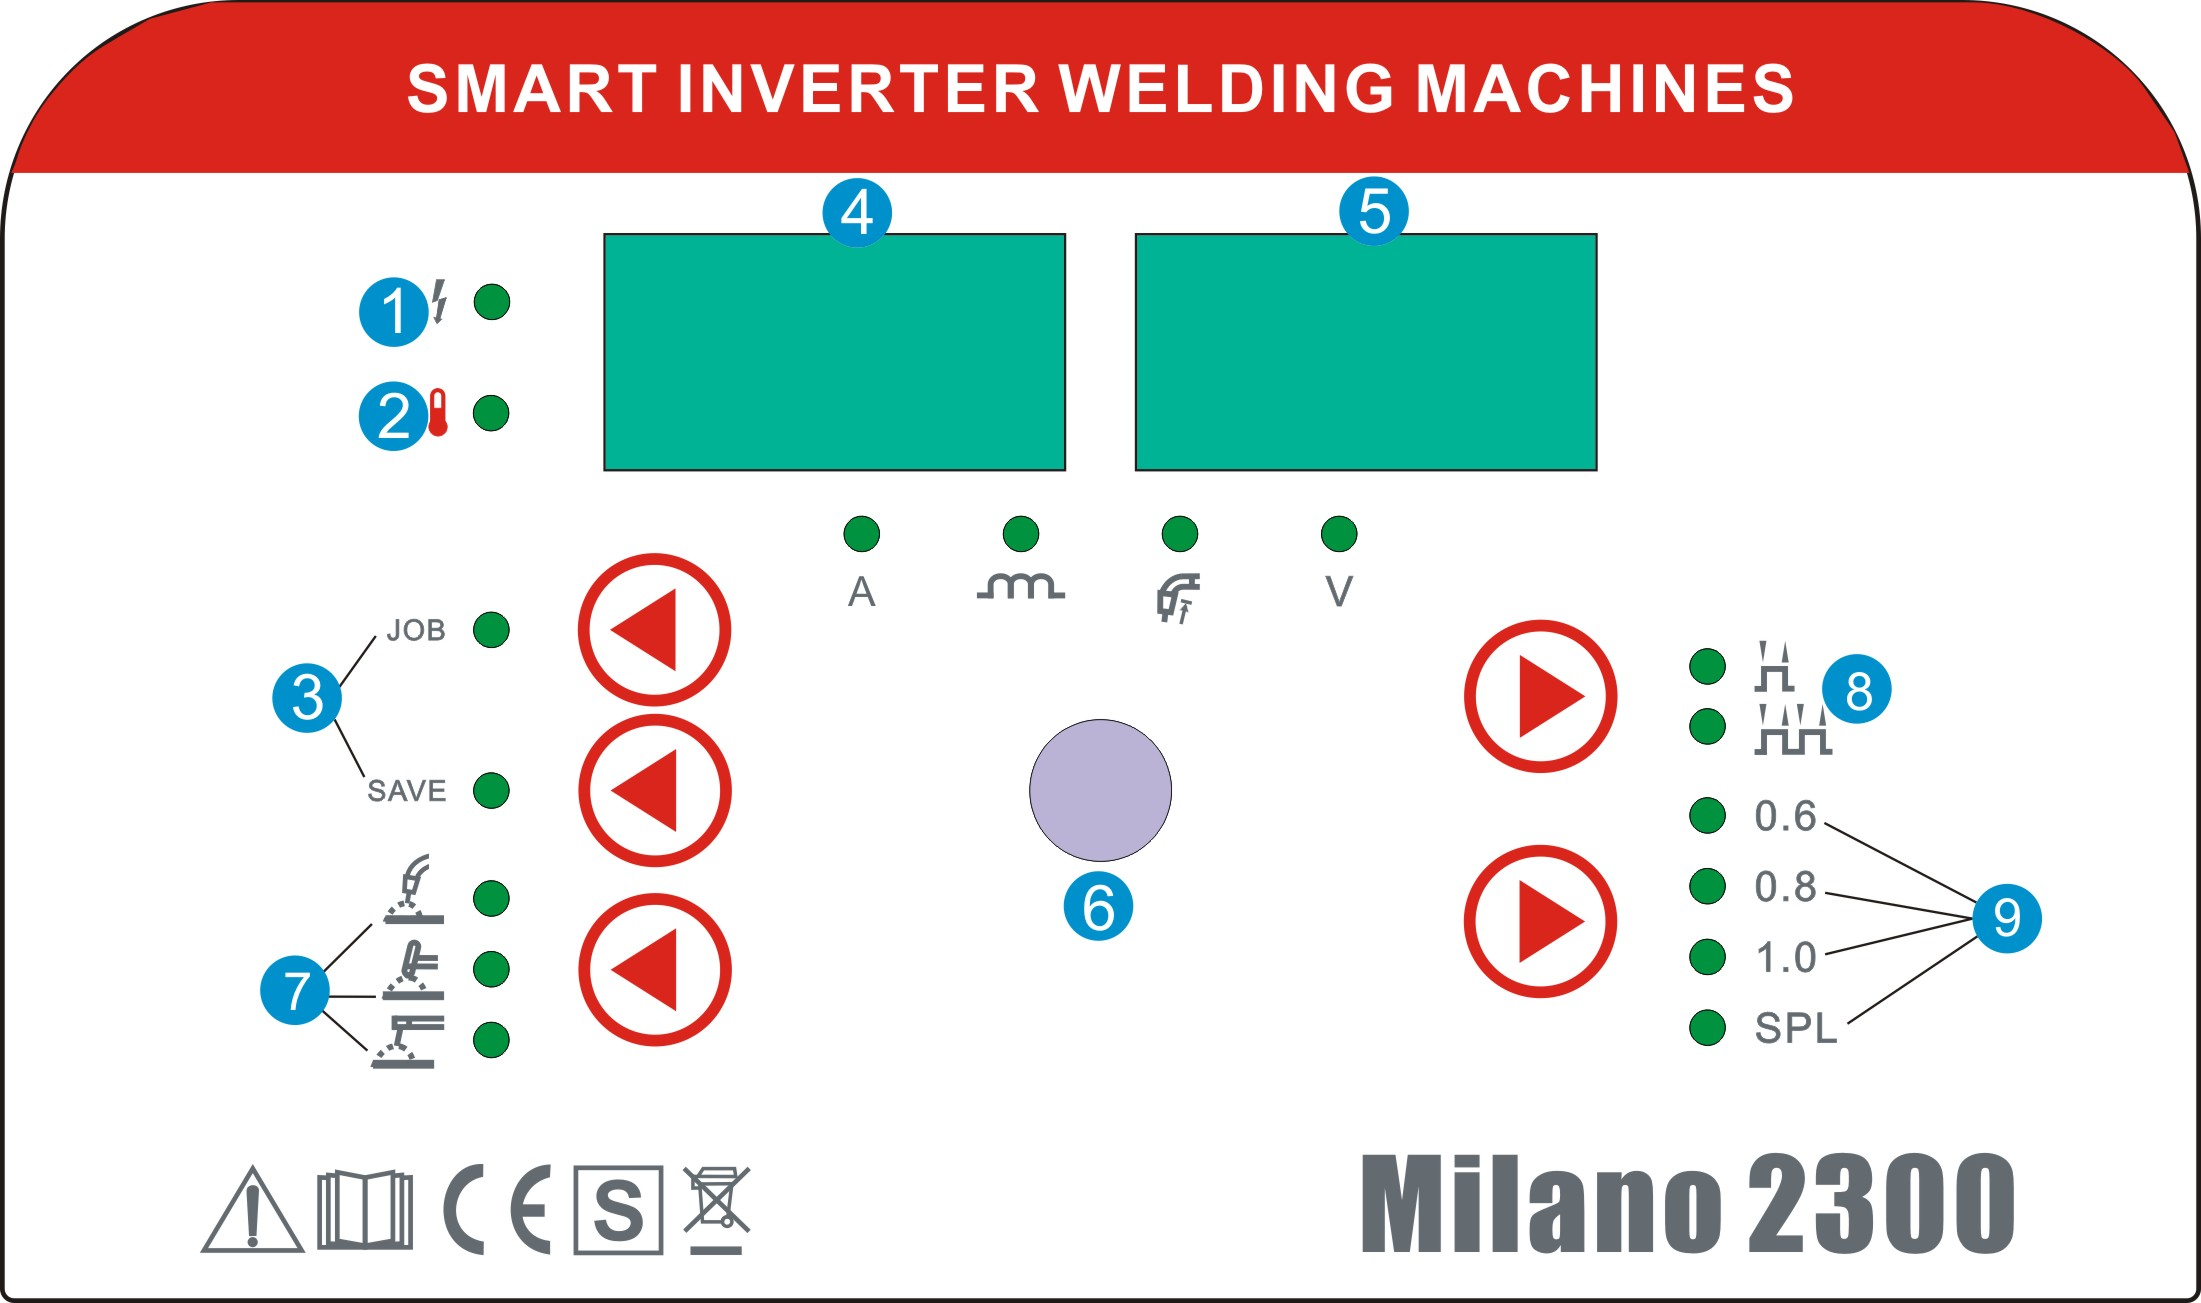 Ovládací panel SIWM Milano 2300 MIG